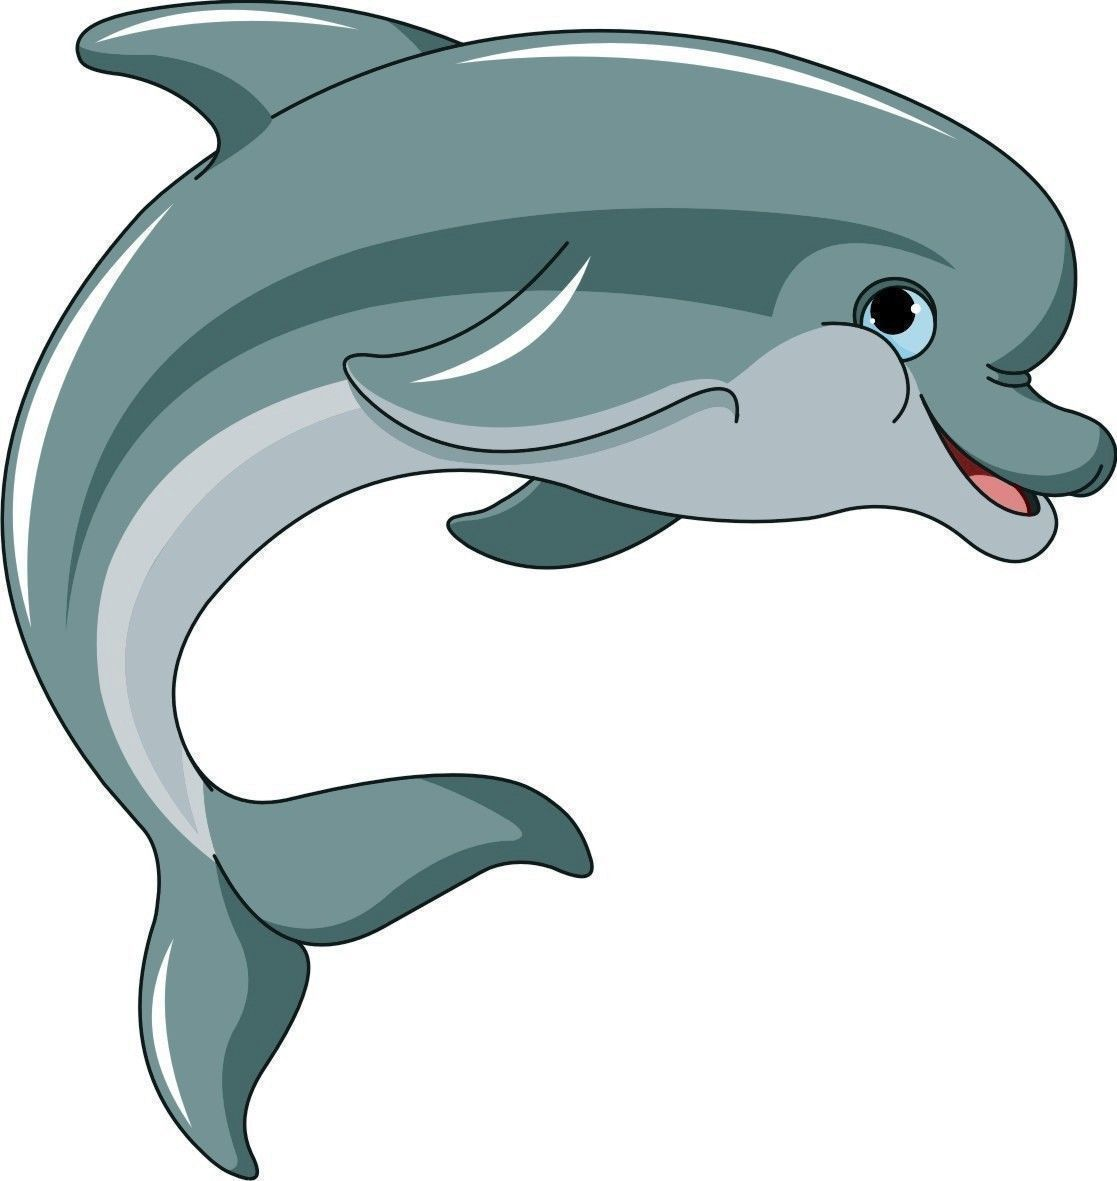 Dolphin Cartoon Flipper Sticker Decal Graphic Vinyl Label V1